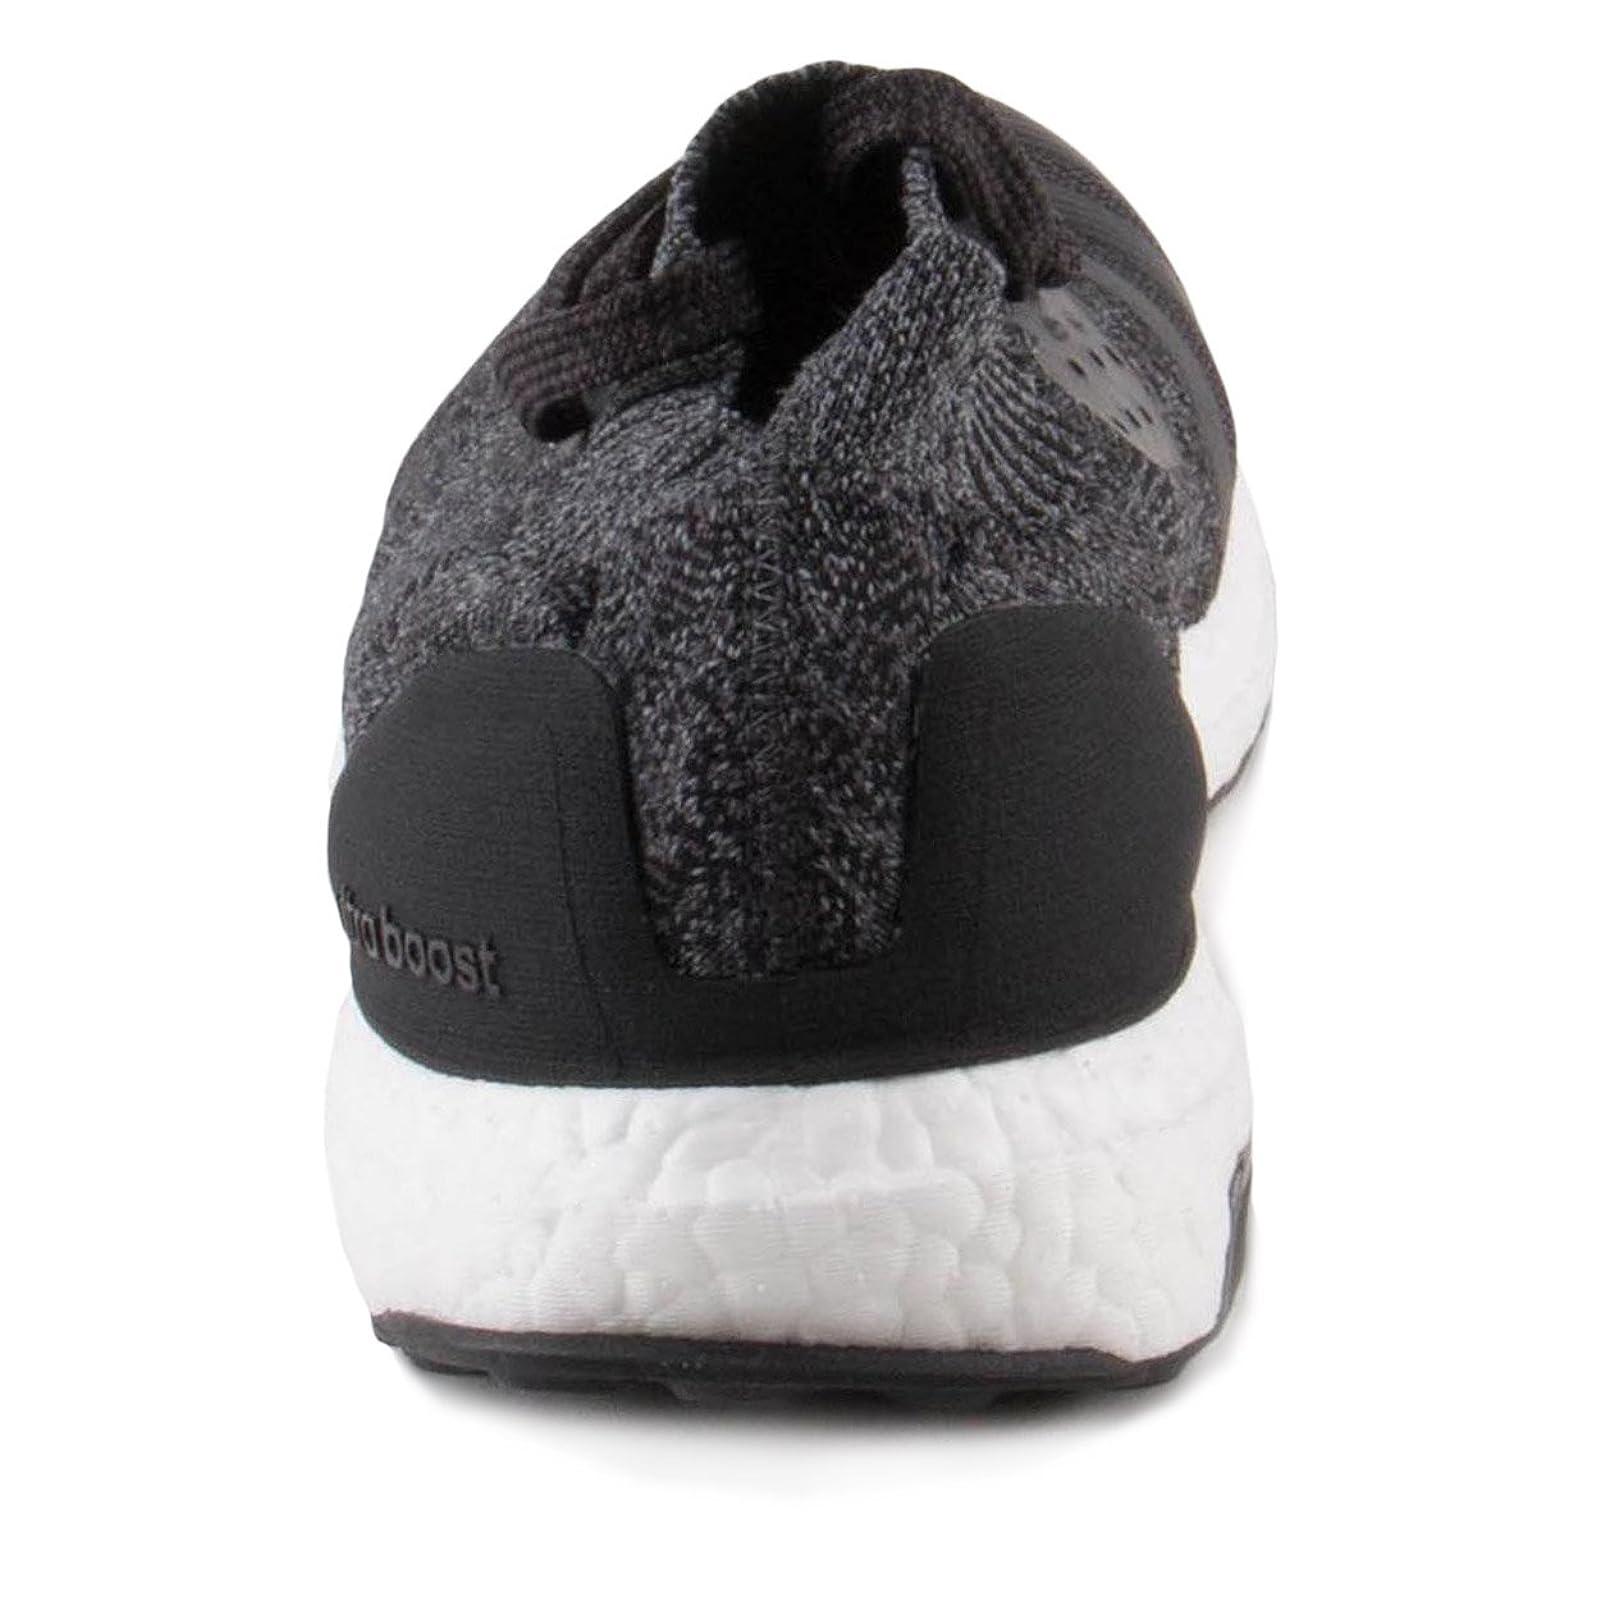 d36c814cc8dea ... adidas Ultraboost Uncaged Shoe Men s Running BY2551 - 3 ...